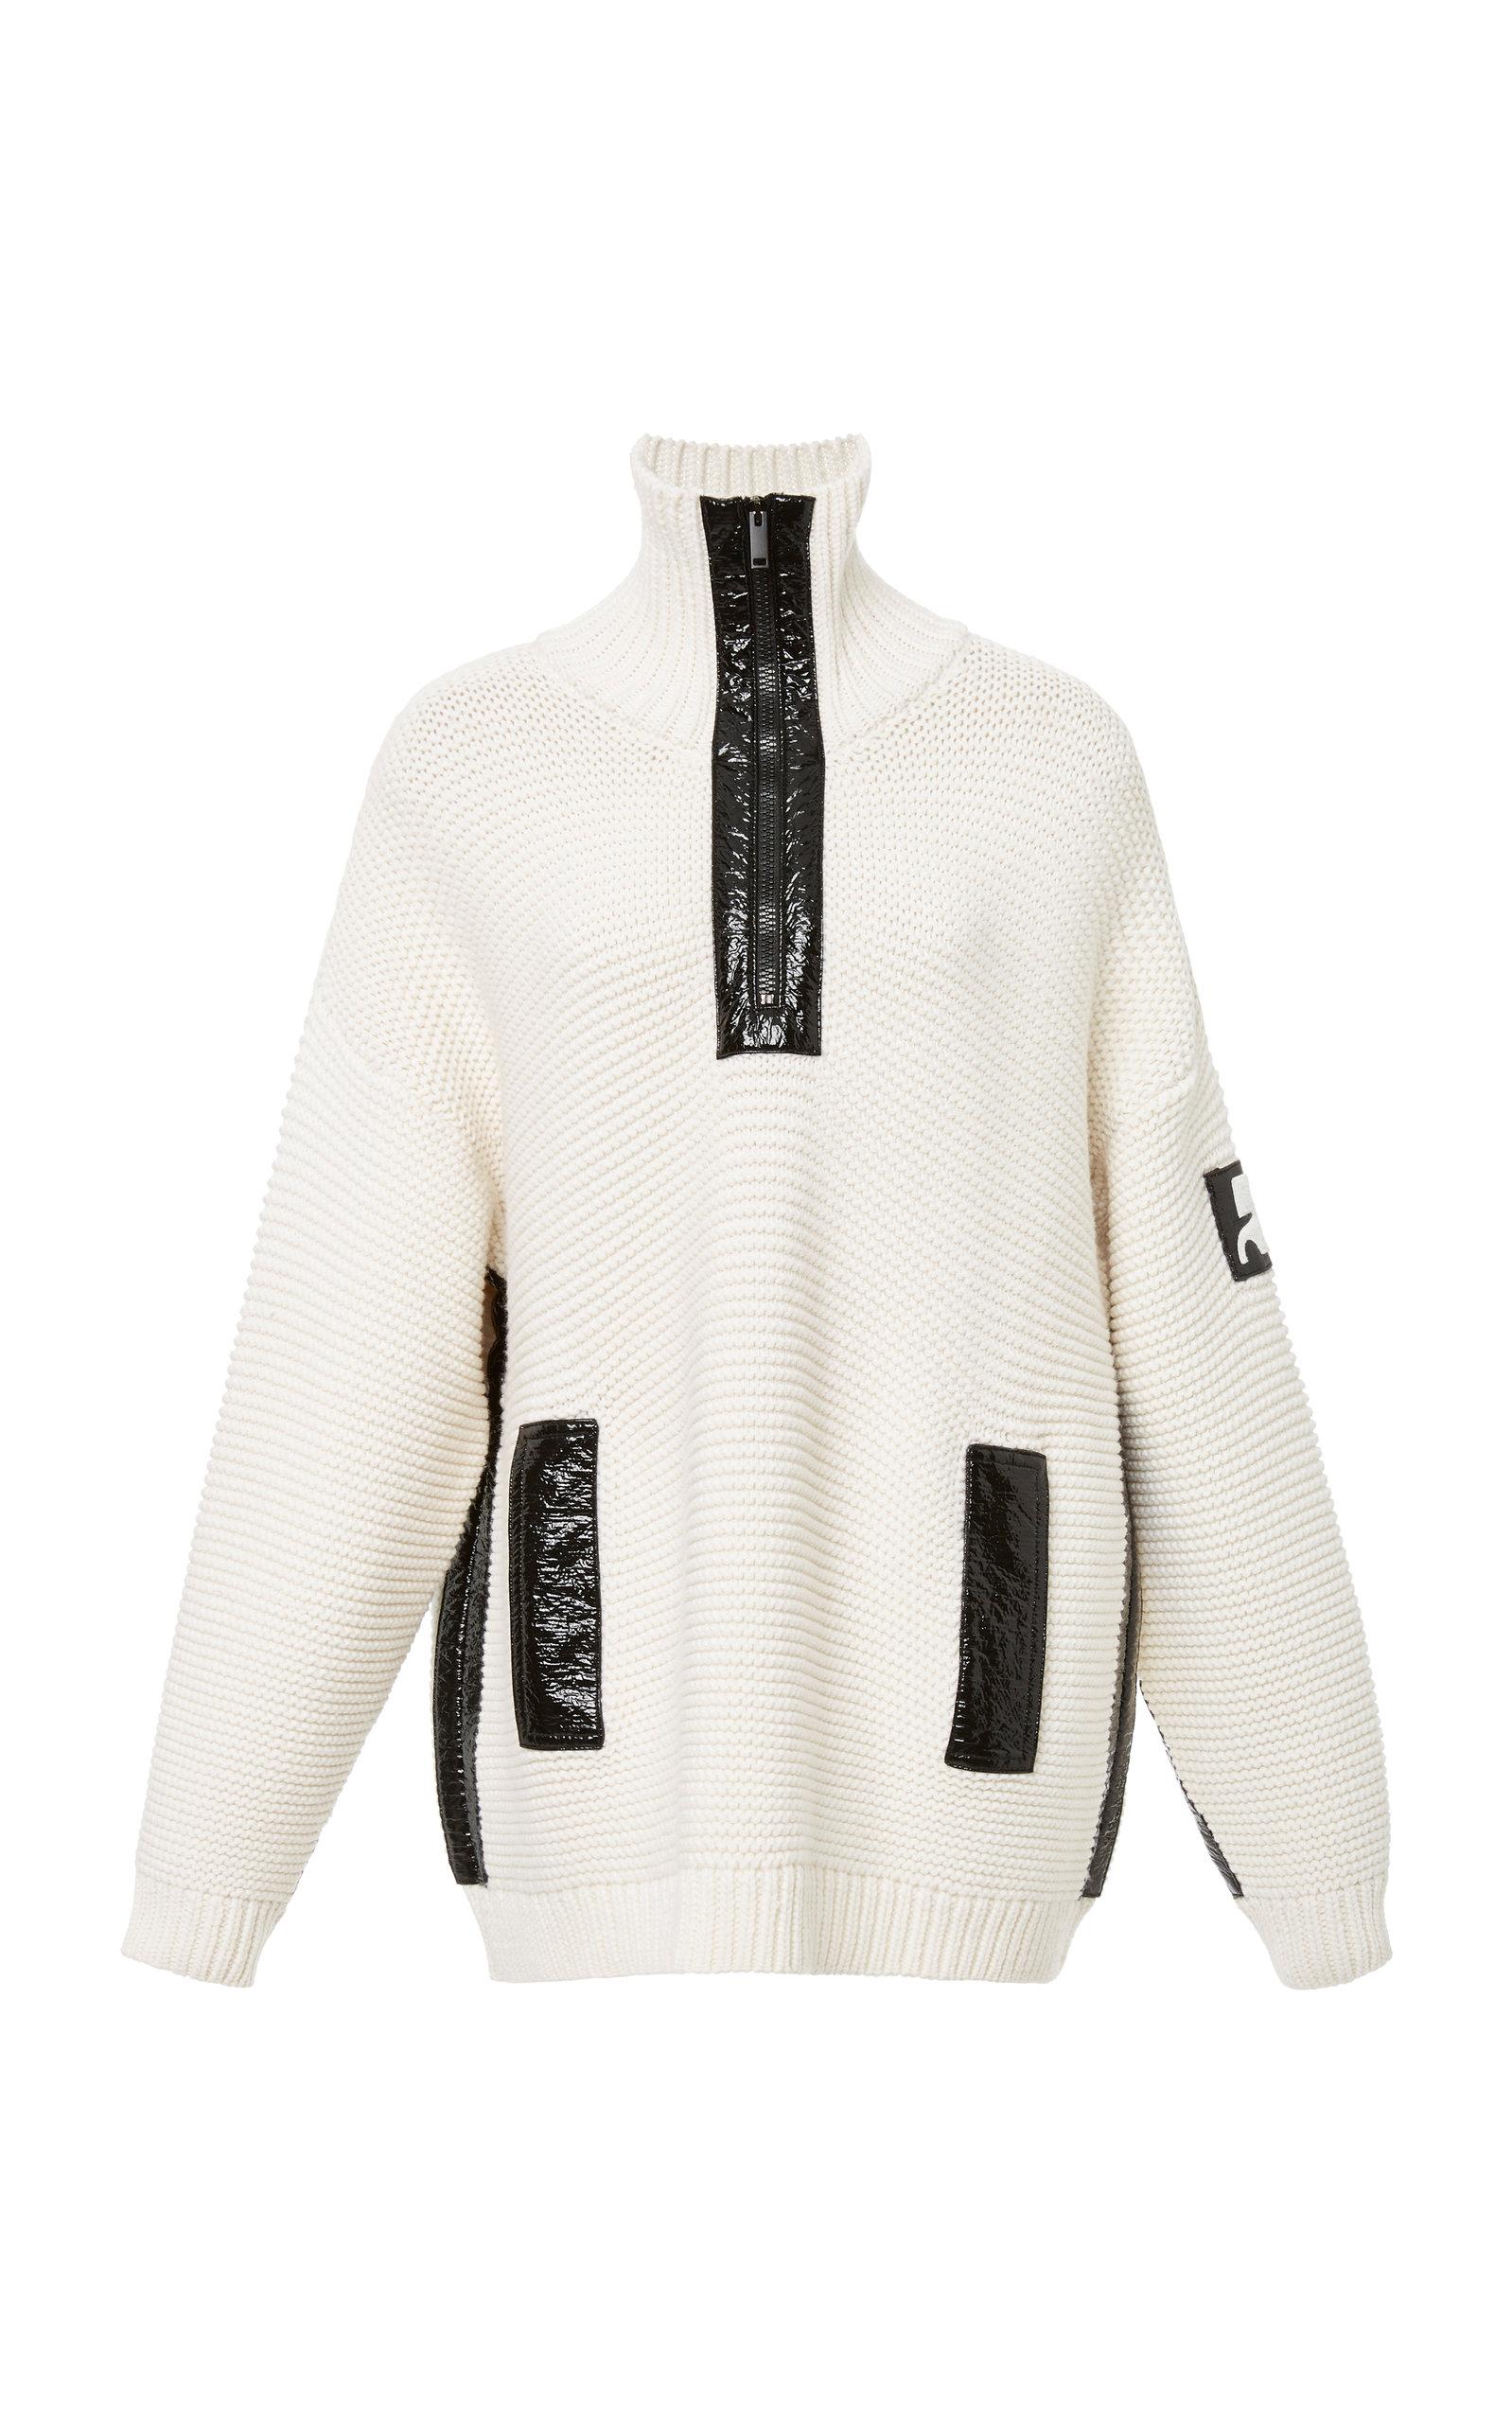 COURRÈGES Vinyl-Detail Zip-Up Wool Sweater in White